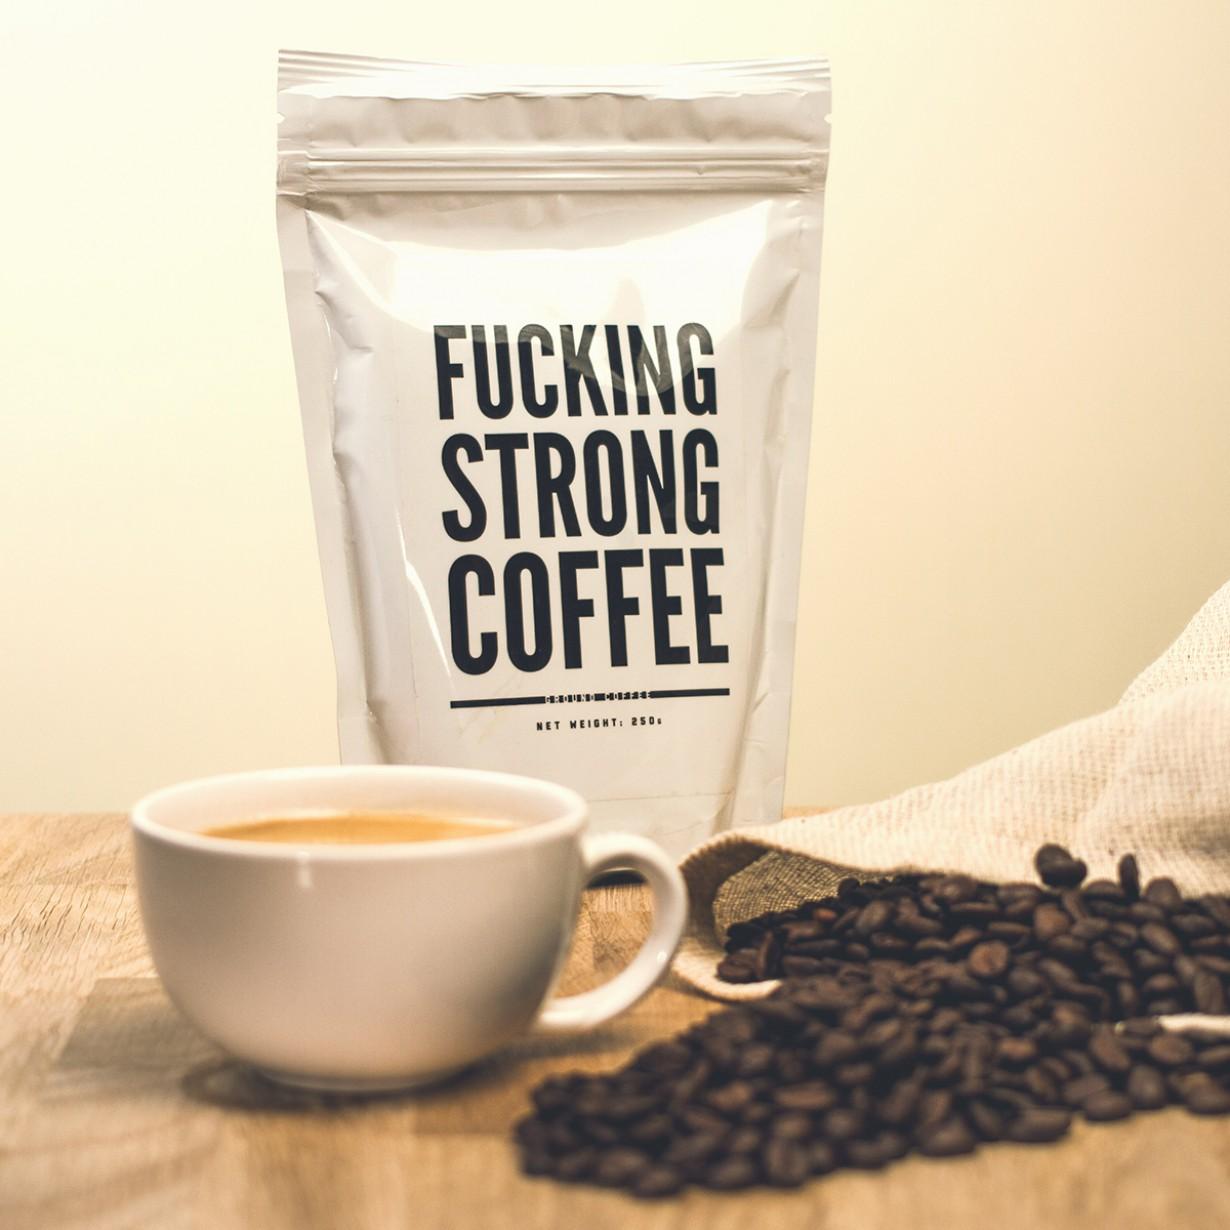 fcking-strong-coffee-verdammt-starker-kaffee-726